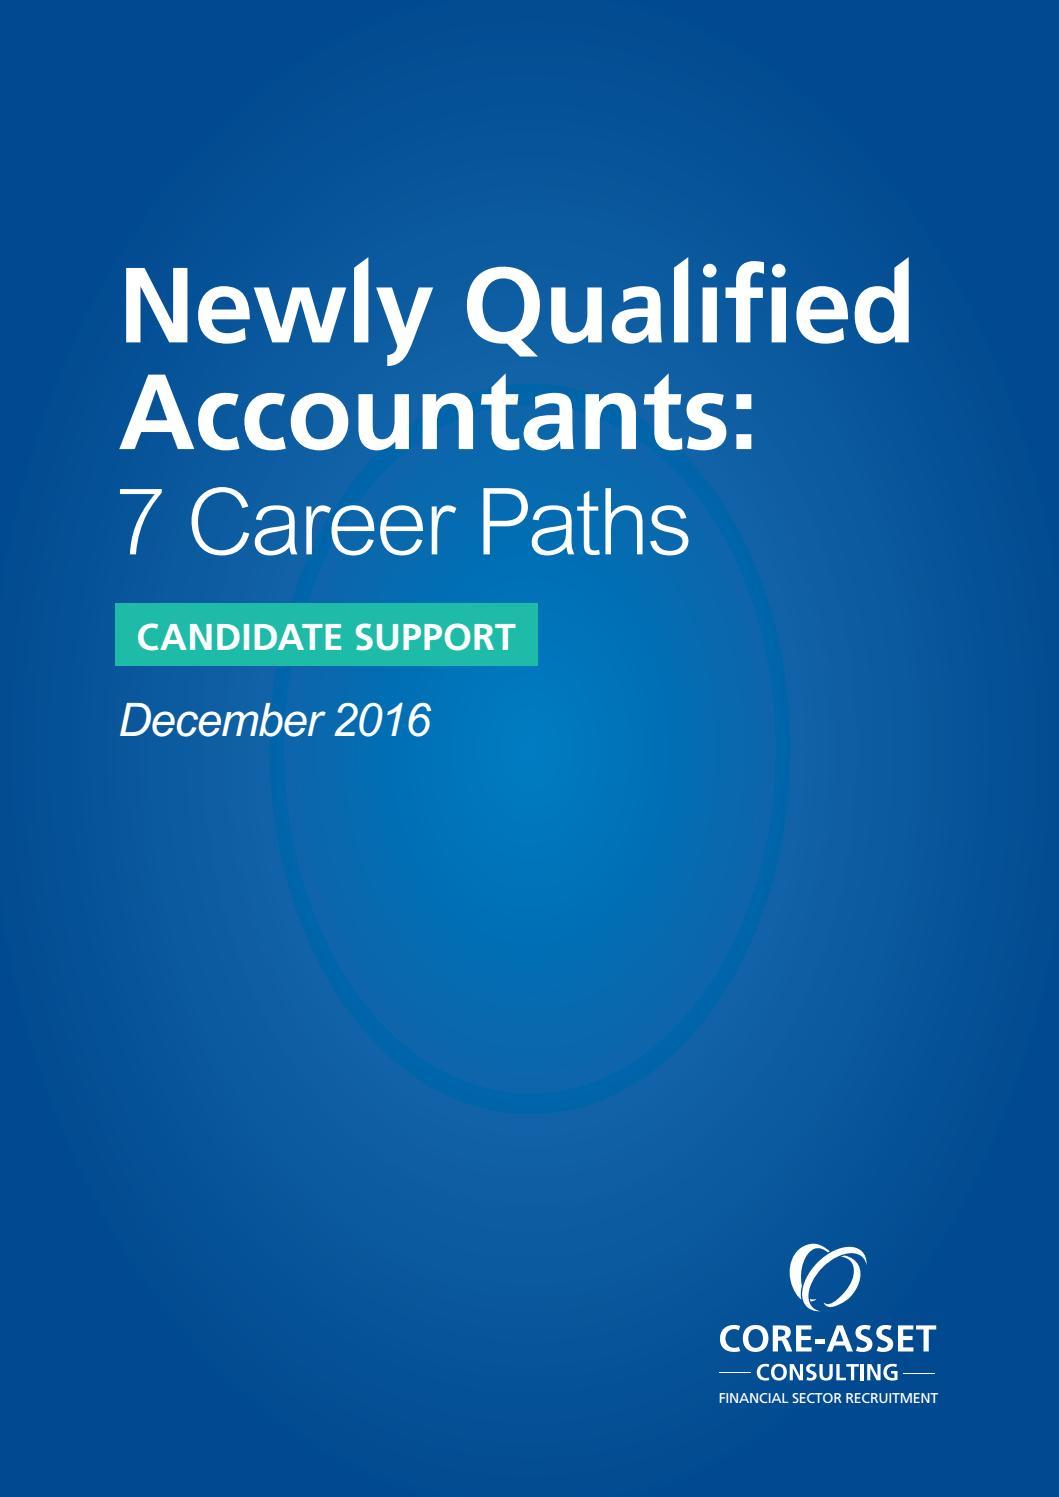 corporate tax accountant career path